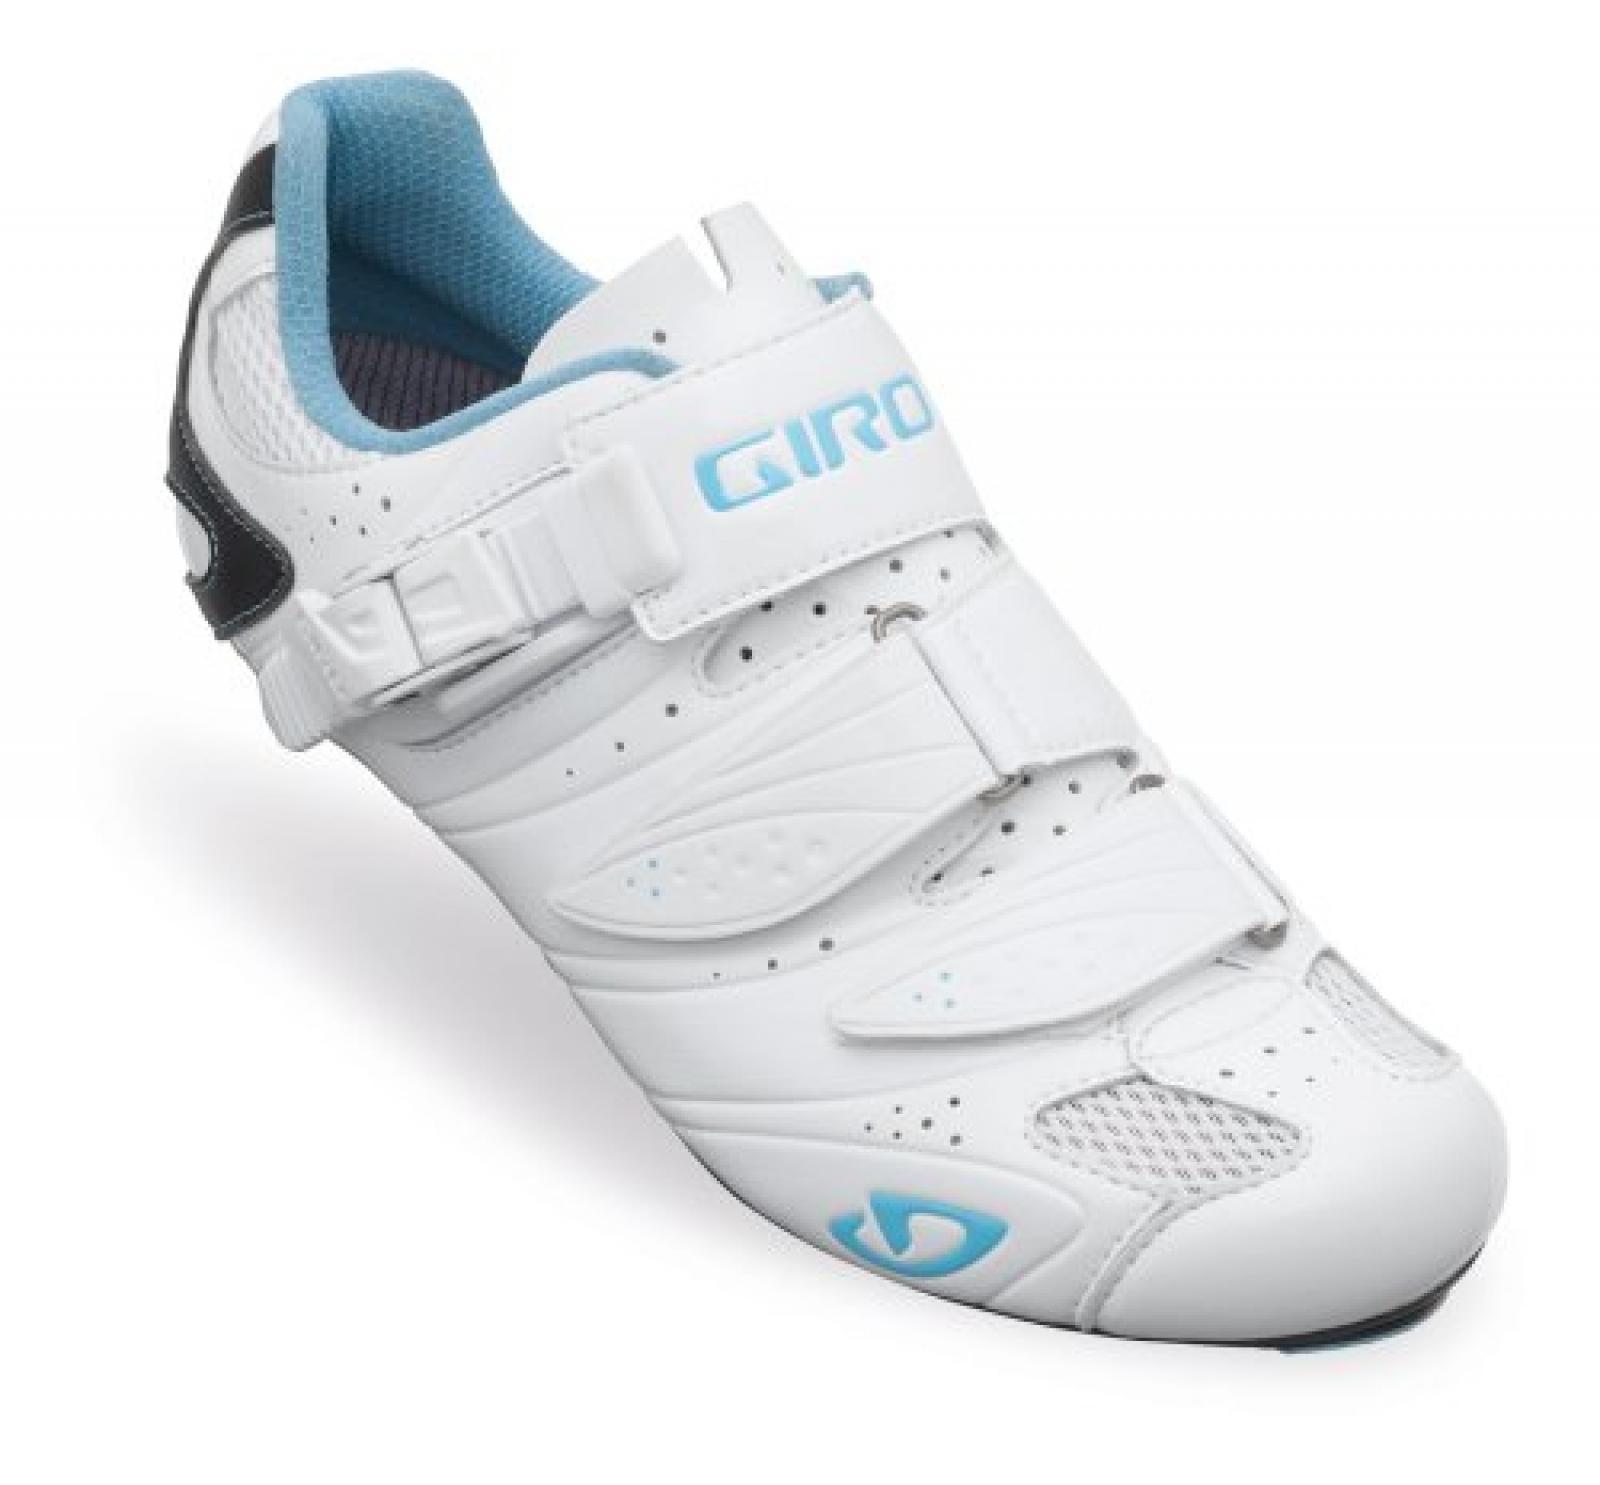 Giro Factress Damen Rennrad Fahrrad Schuhe weiß/blau 2014